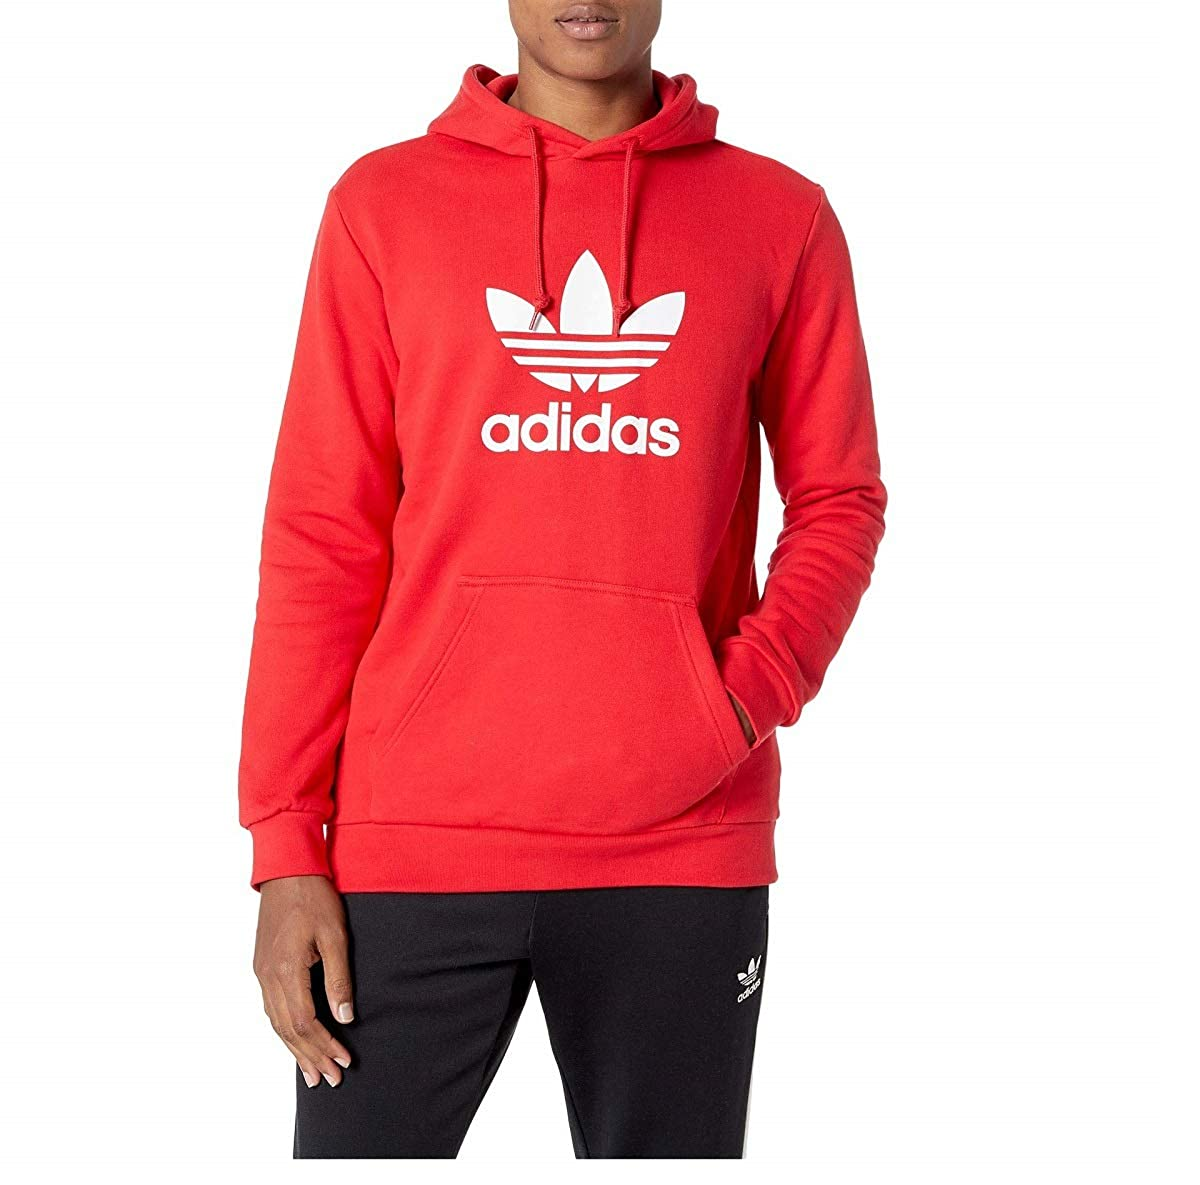 d2ff5ed2f8170 adidas Originals Men's Kids Trefoil Hooded Sweatshirt